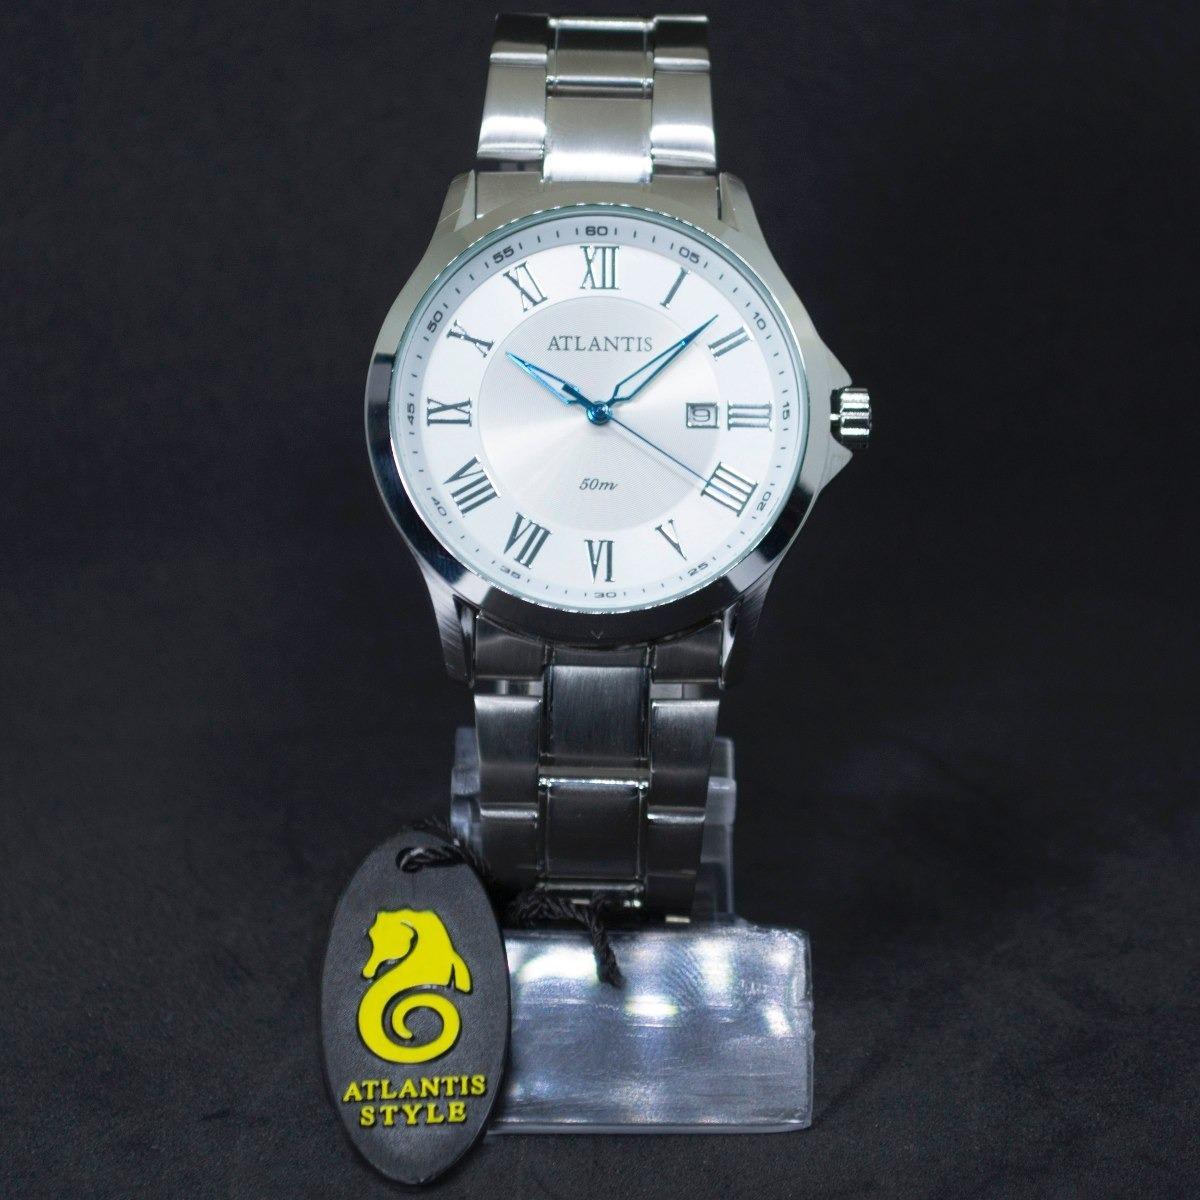 87bd4525a83 relógio masculino atlantis original algarismo romano prata. Carregando zoom.